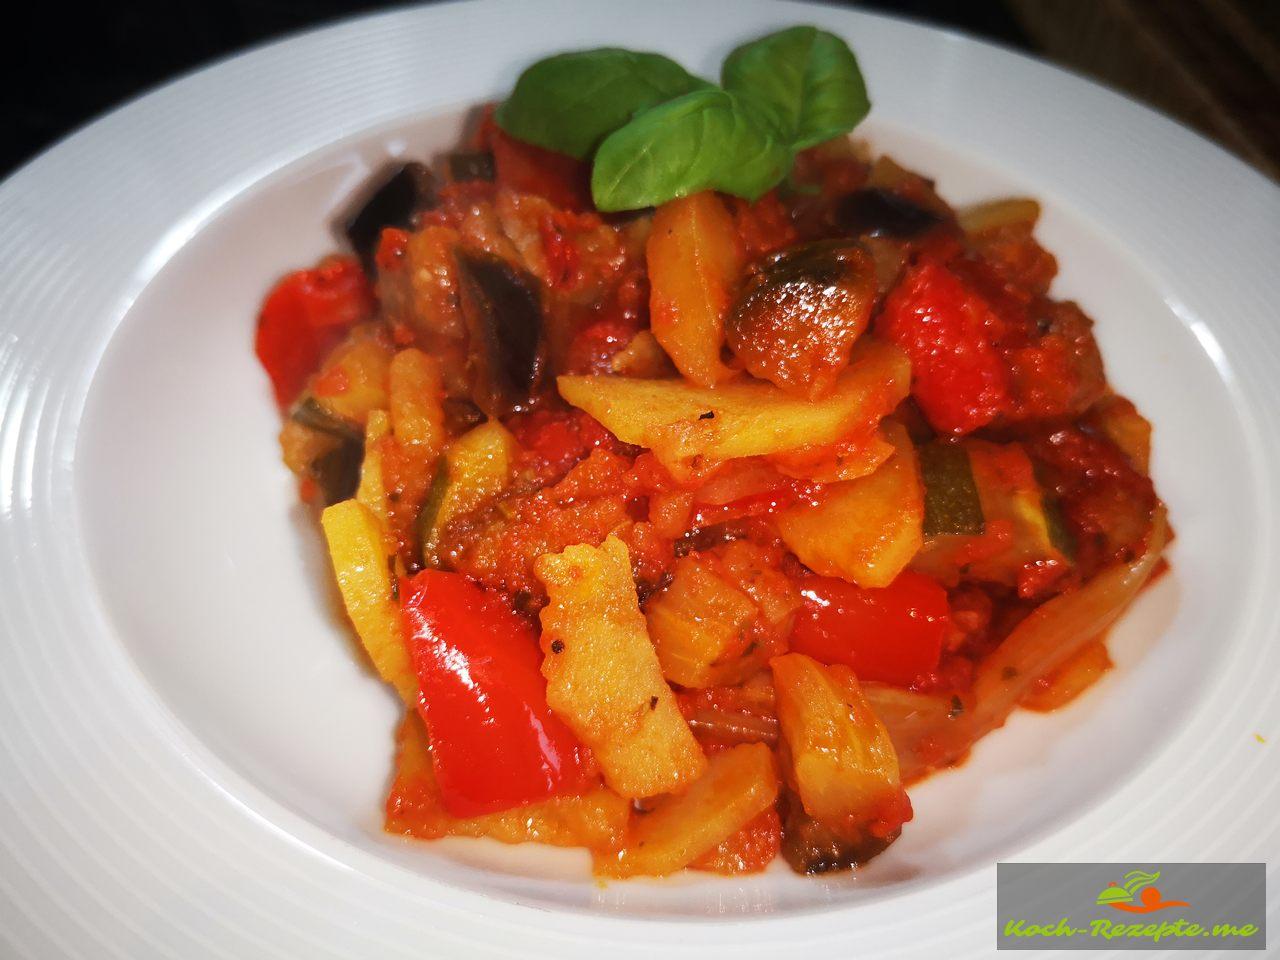 Ratataouille Gemüse Gericht angerichtet